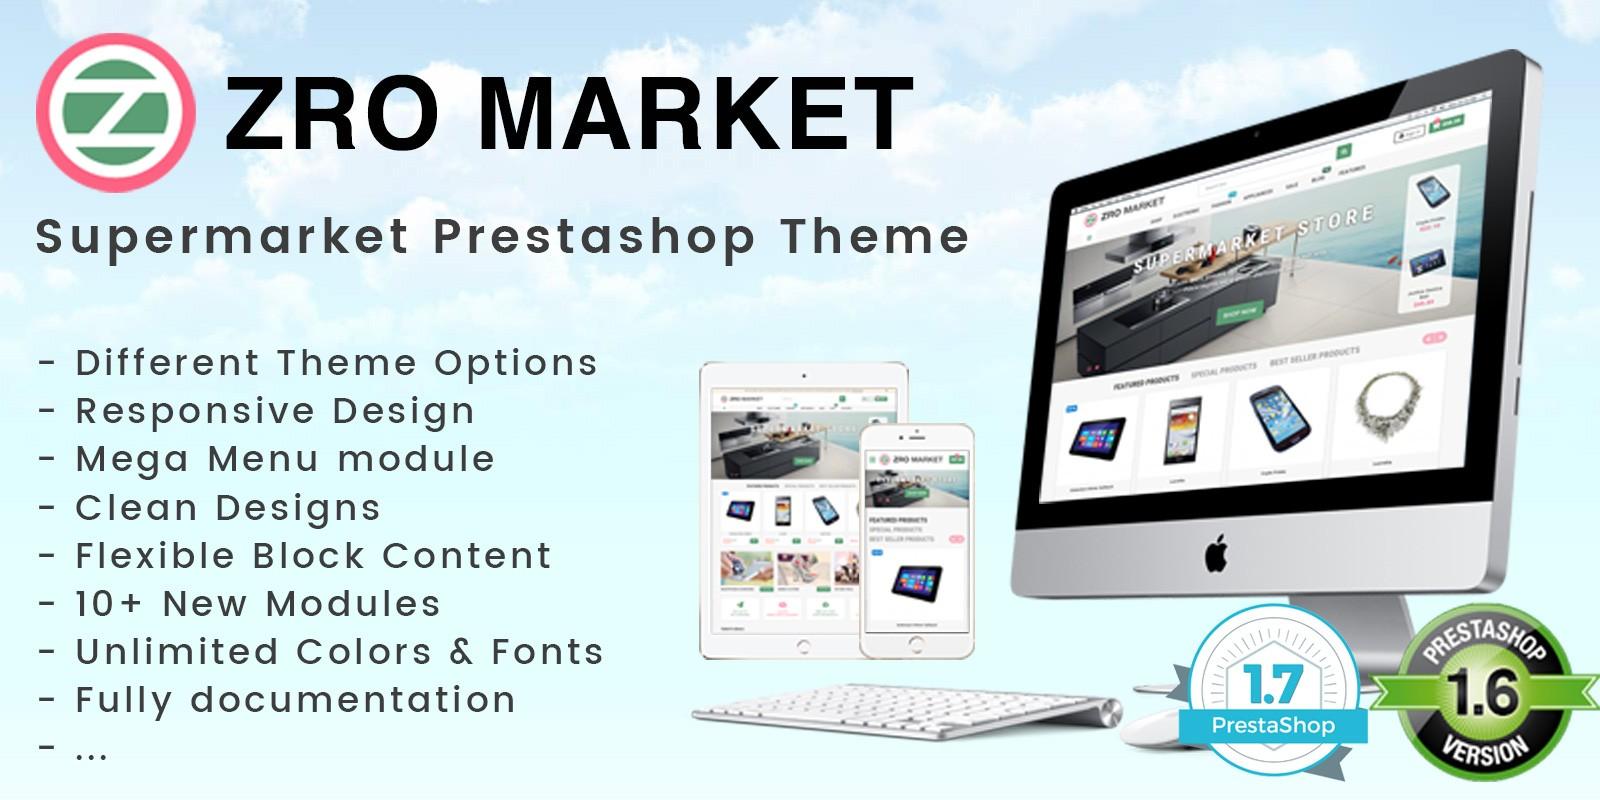 Zro Market - Premium Responsive PrestaShop Theme